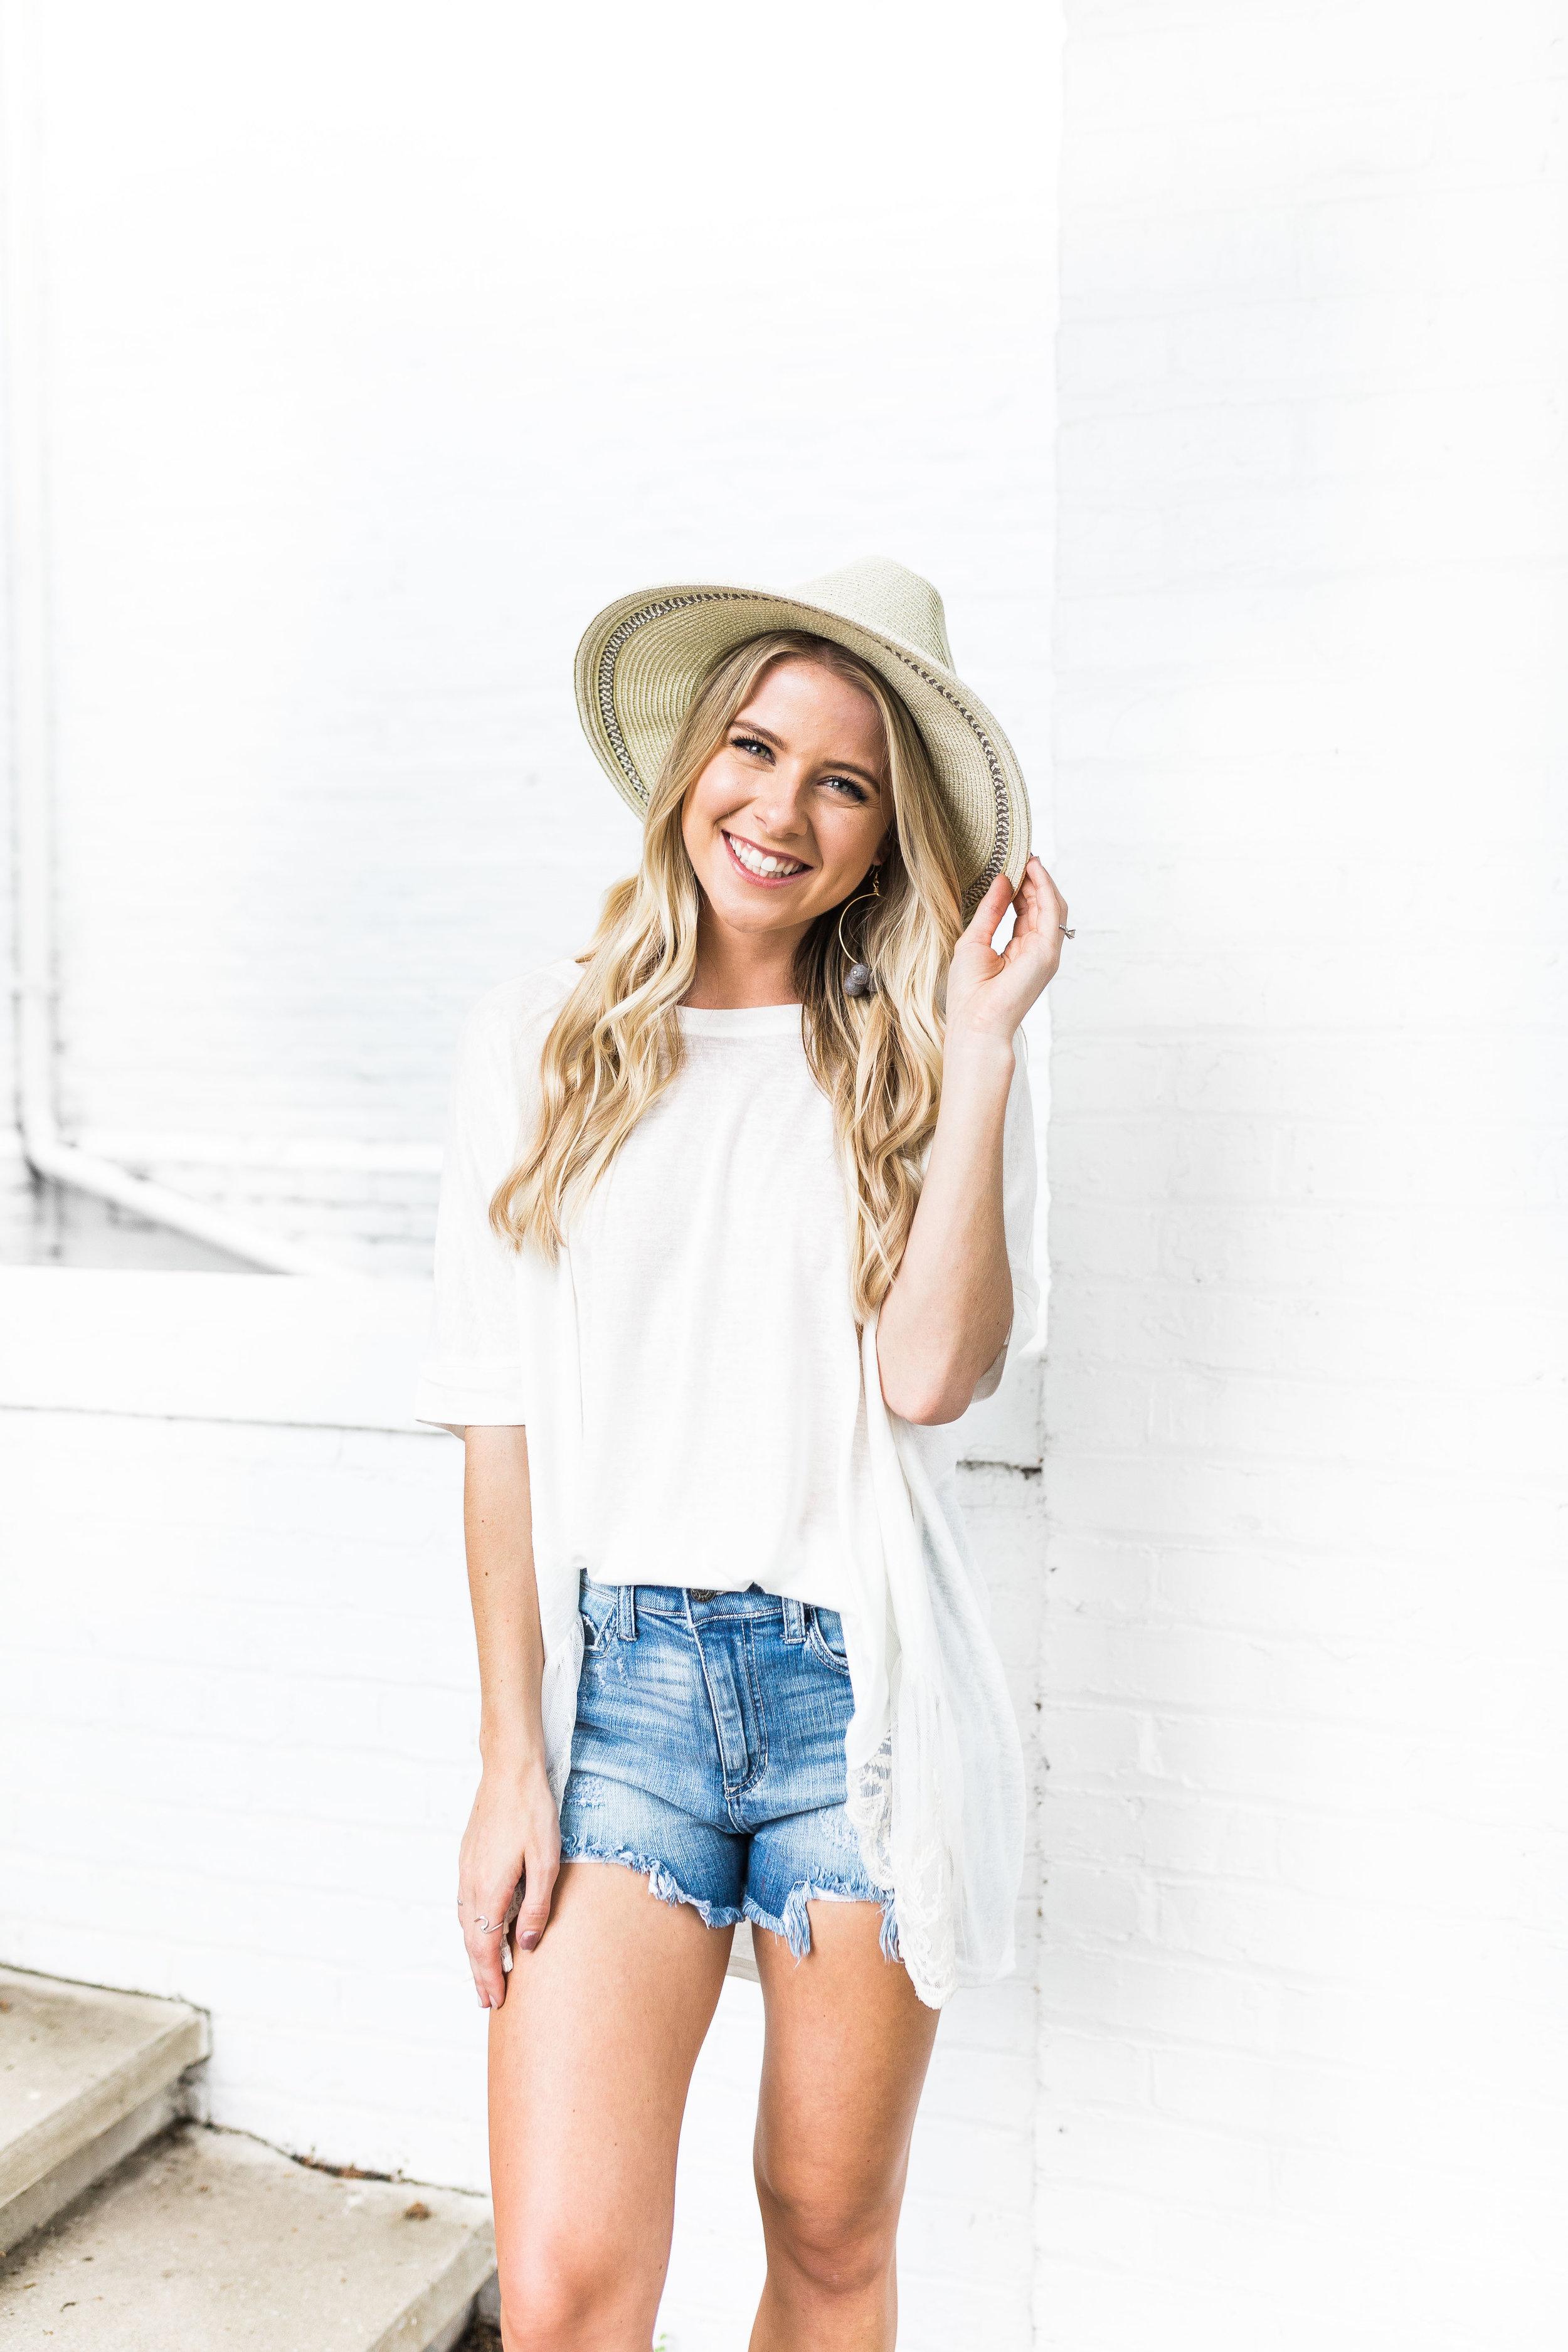 Social Media Influencer/ Fashion Blogger